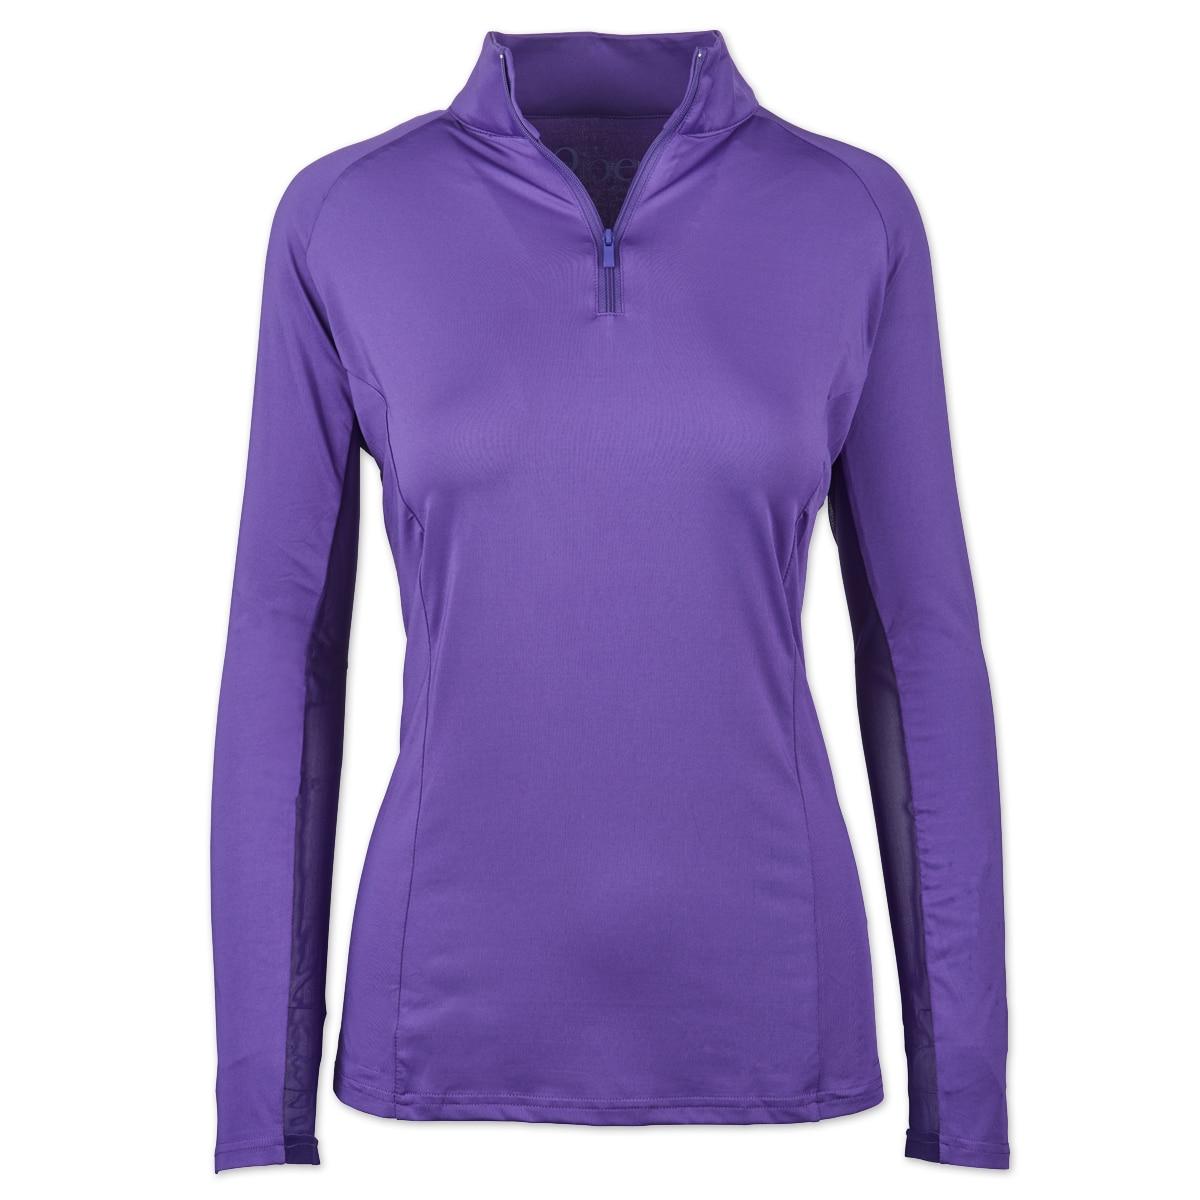 d6b79db2ad819c Piper Long Sleeve 1/4 Zip Sun Shirt by SmartPak